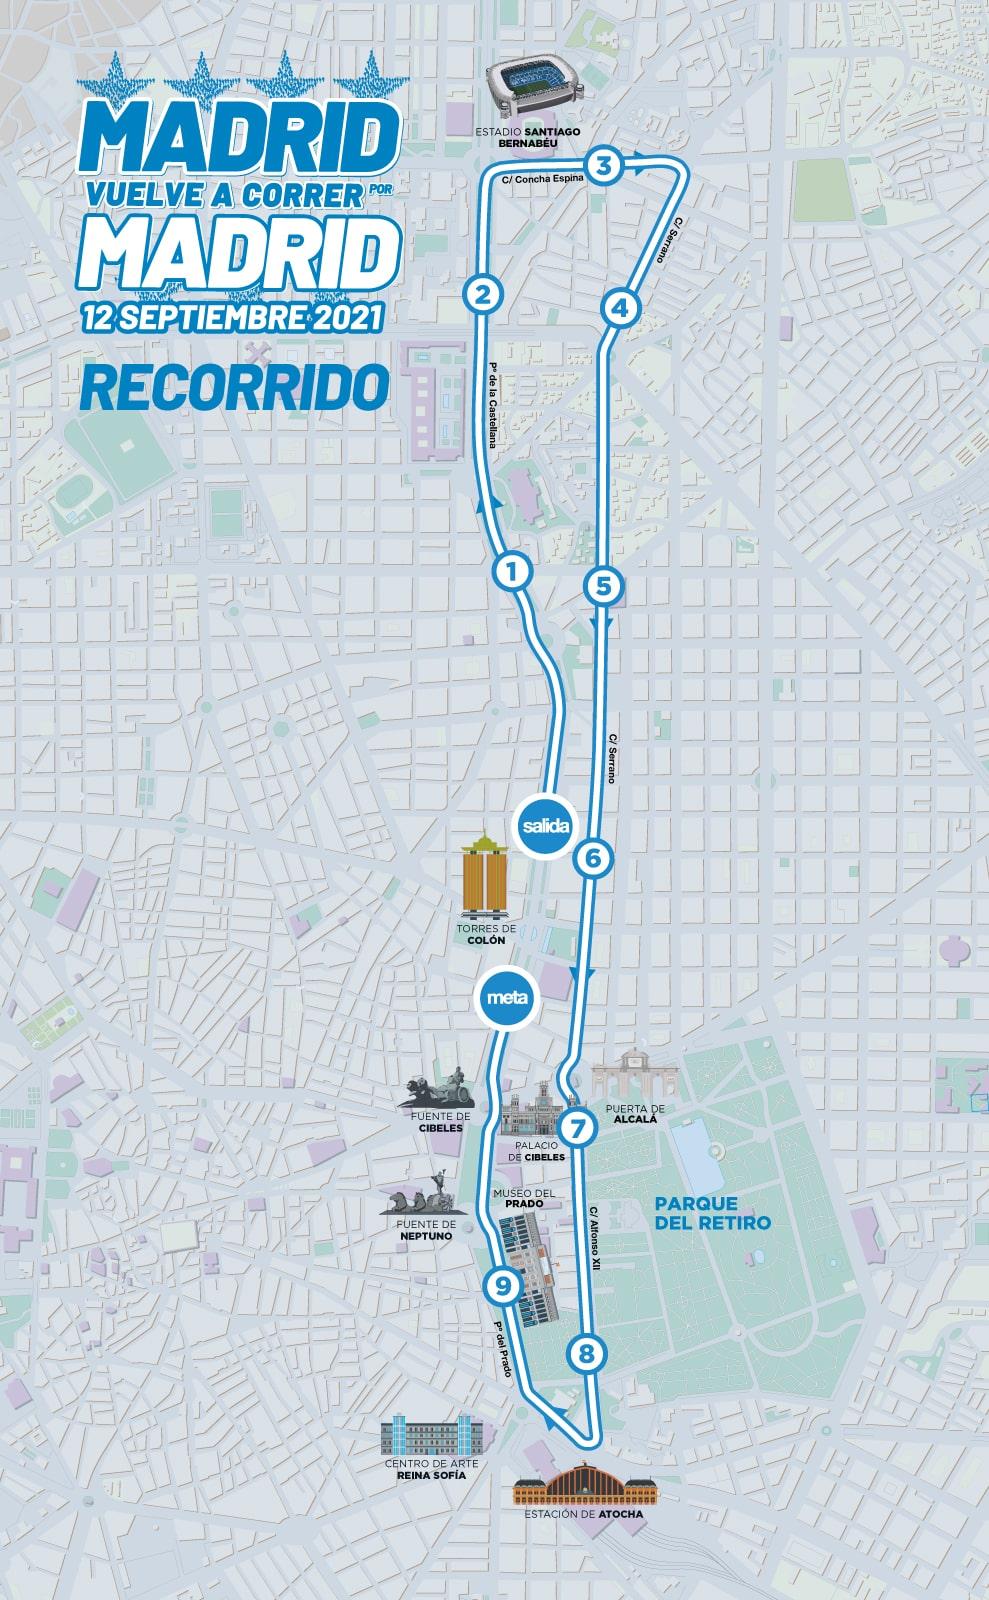 Madrid vuelve a correr Madrid 2021, mapa